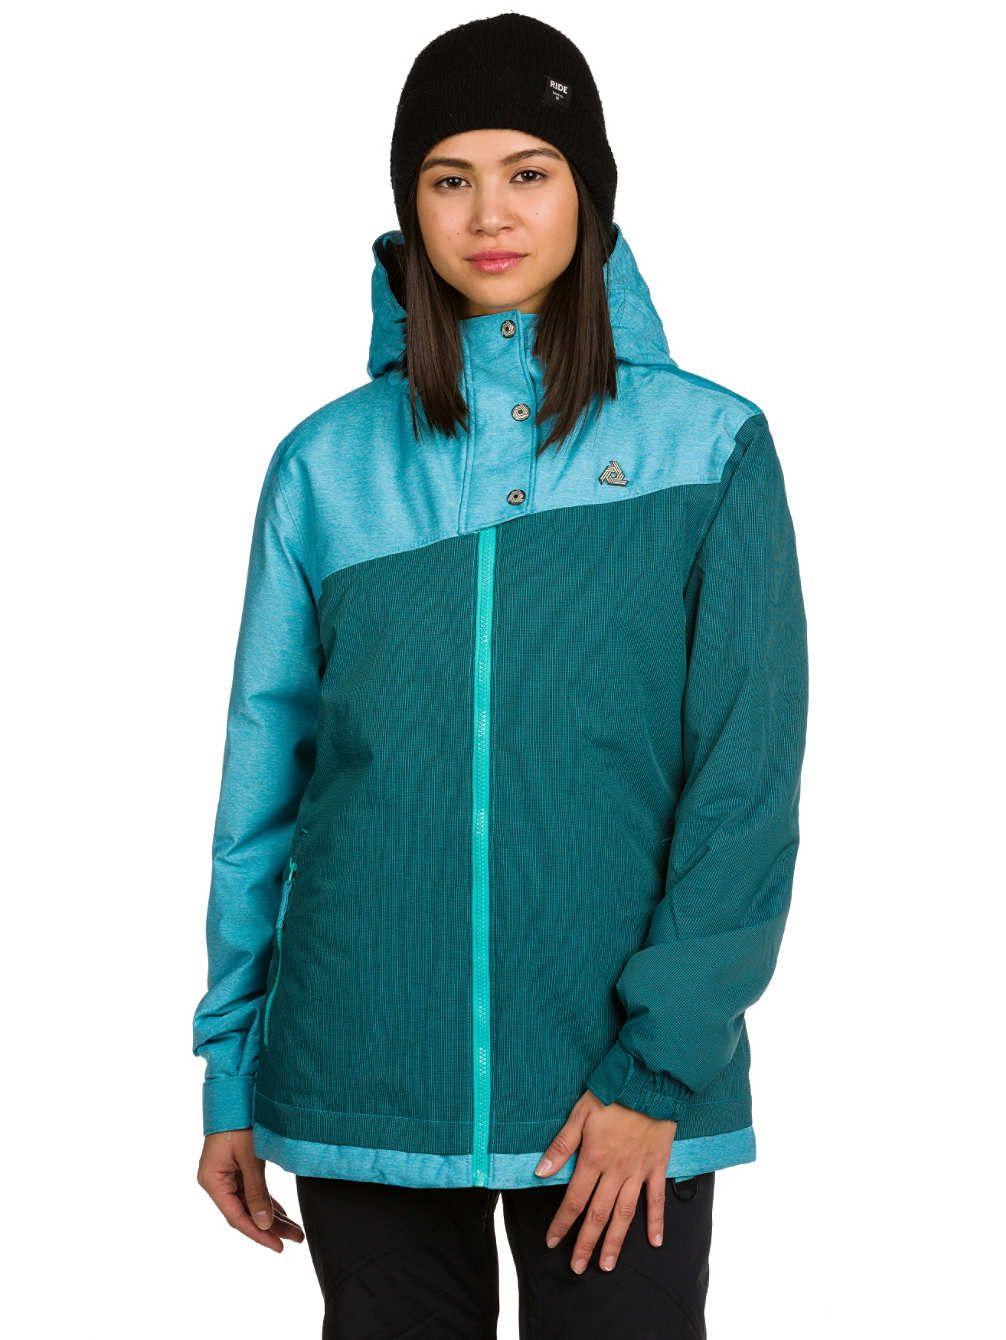 Køb Aperture Girls Harmony Jacket online hos blue-tomato.com